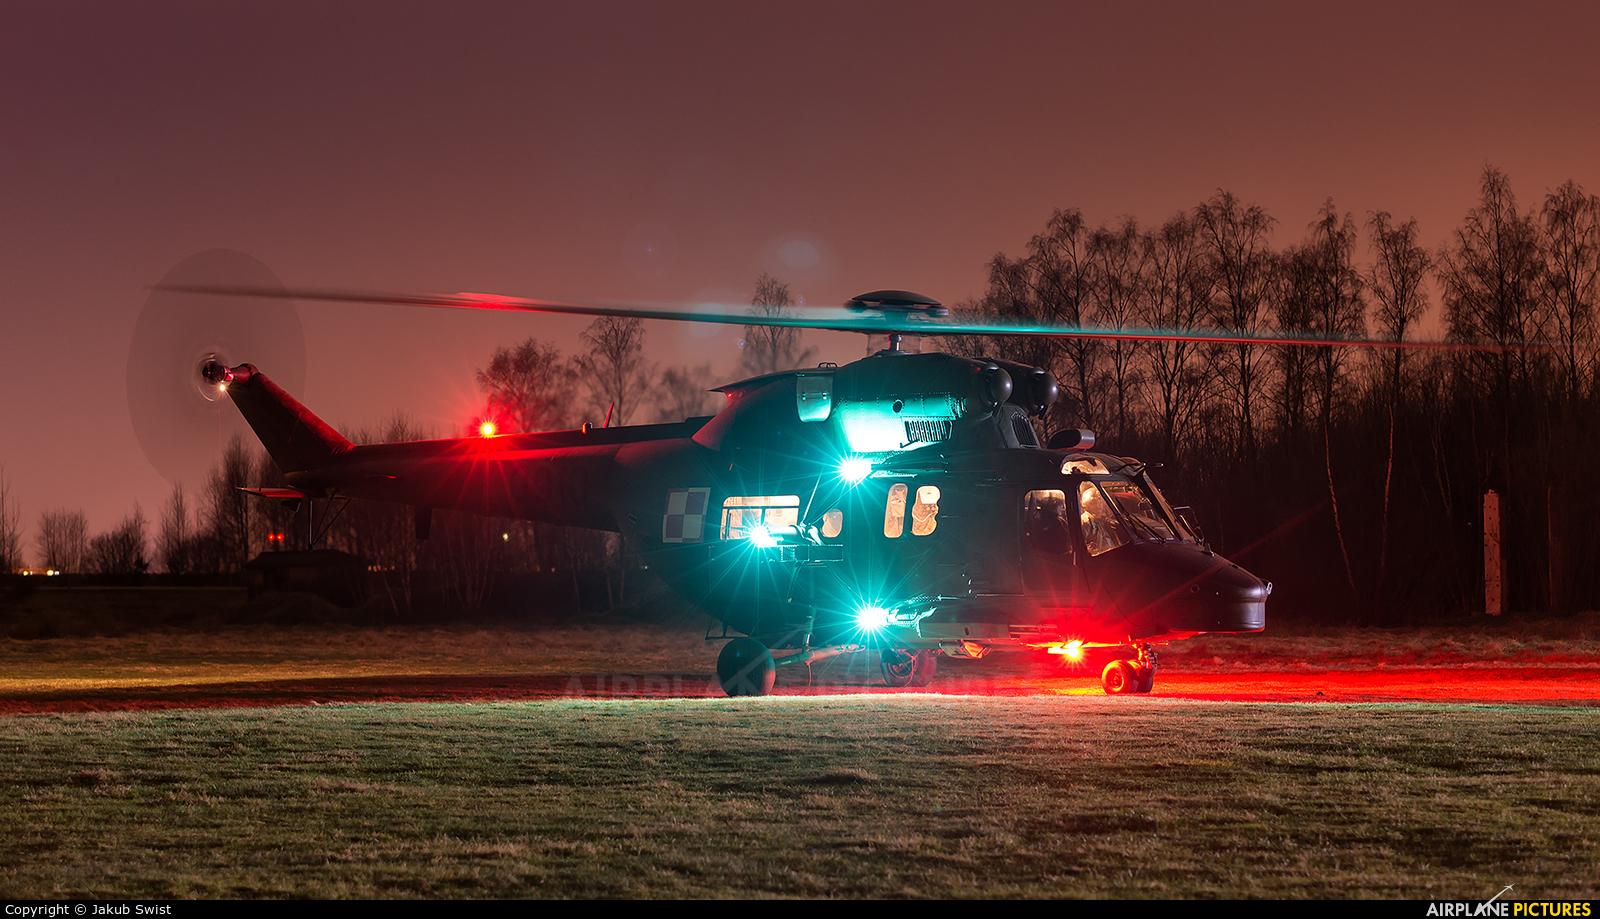 Poland - Air Force 0910 aircraft at Nowy Targ